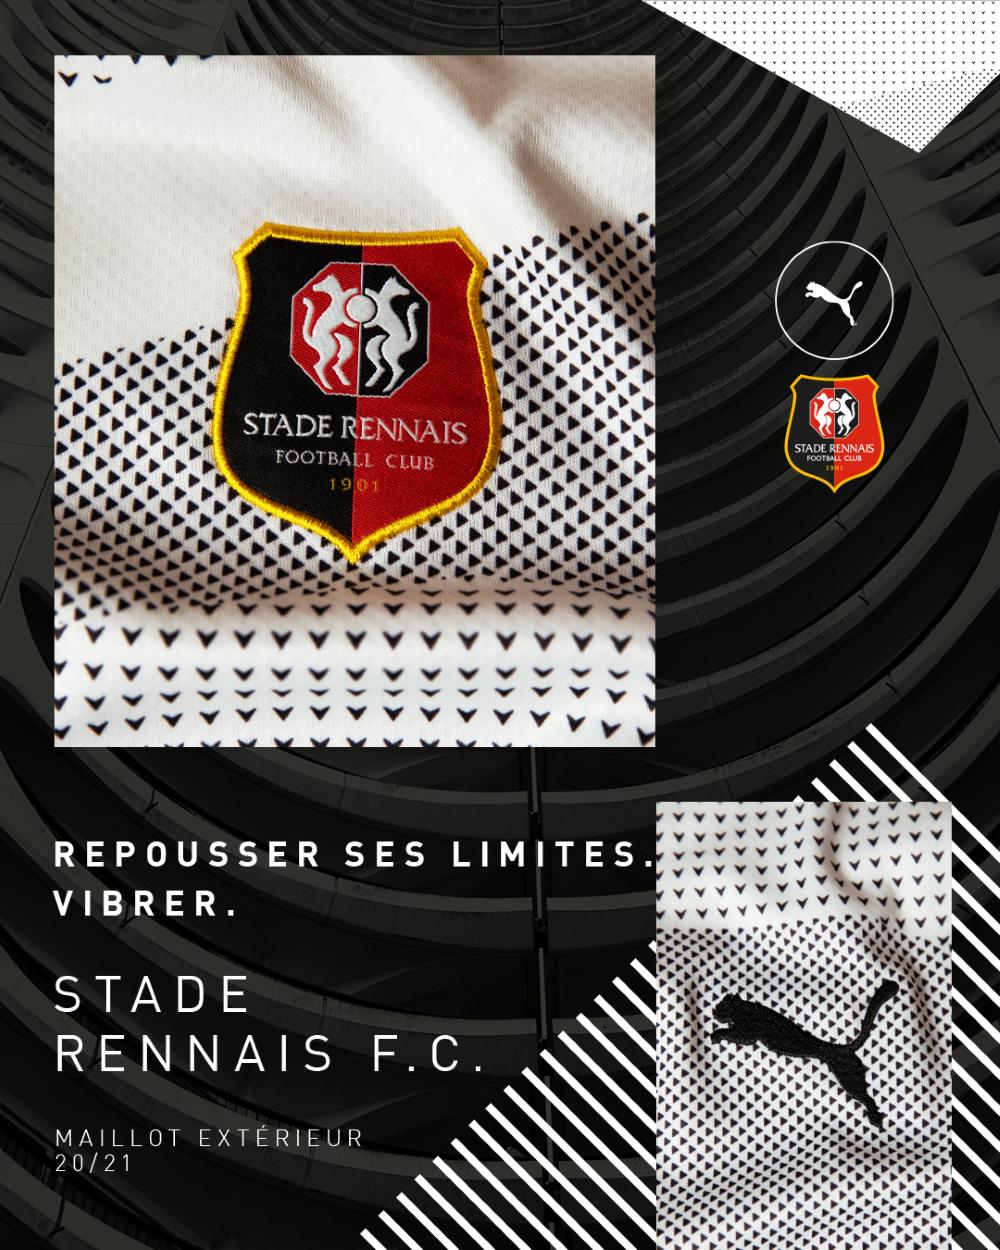 PUMA Football x Stade Rennais F.C Maillot Extérieur 2020-2021